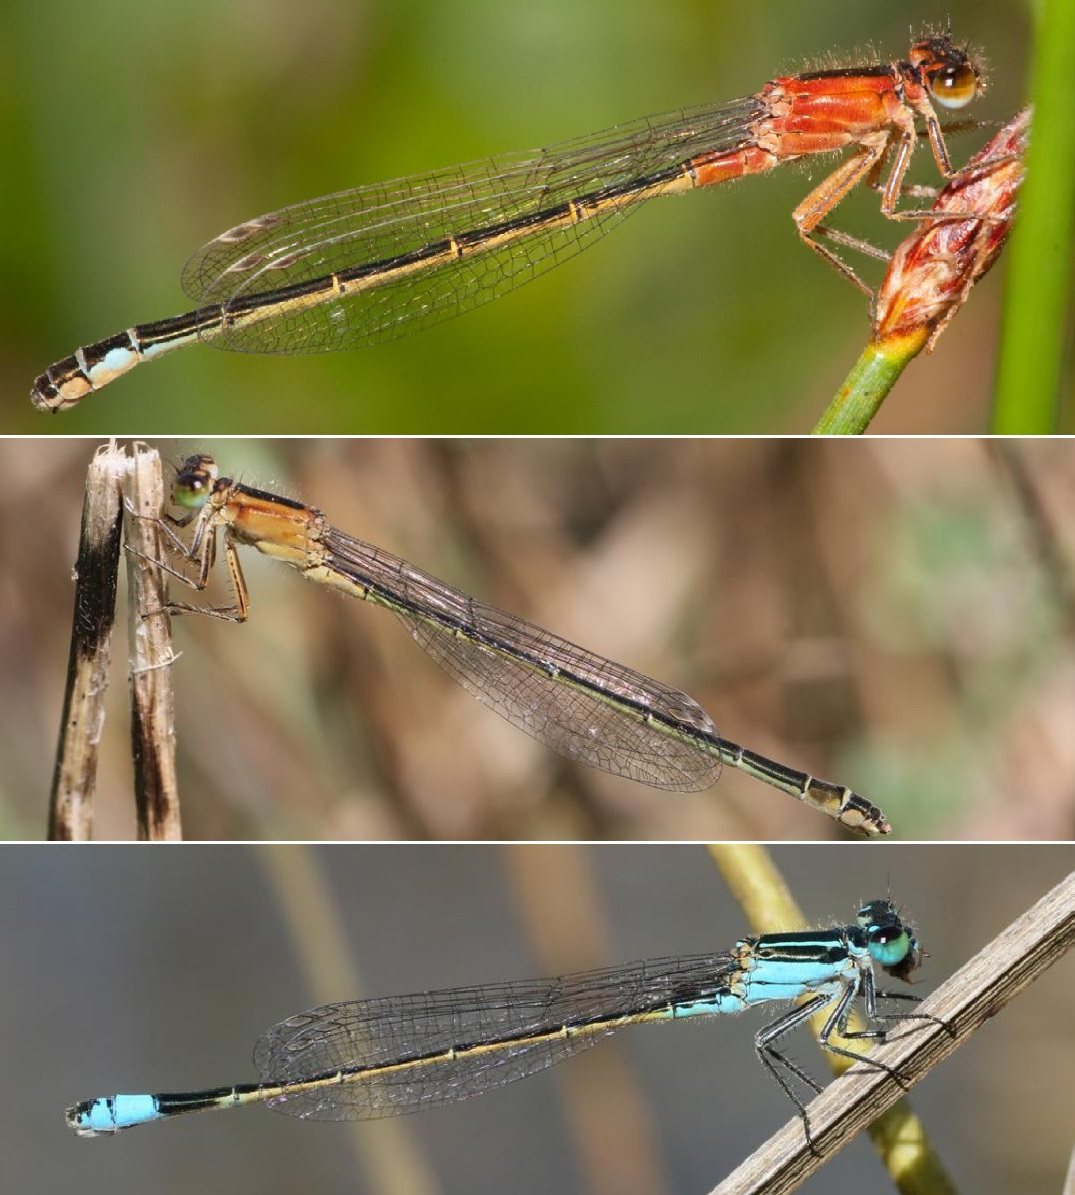 Femias de 'Ischnura pumilio', 'Ischnura elegans' e 'Ischnura ramburii'. Fotos: Adolfo Cordero.